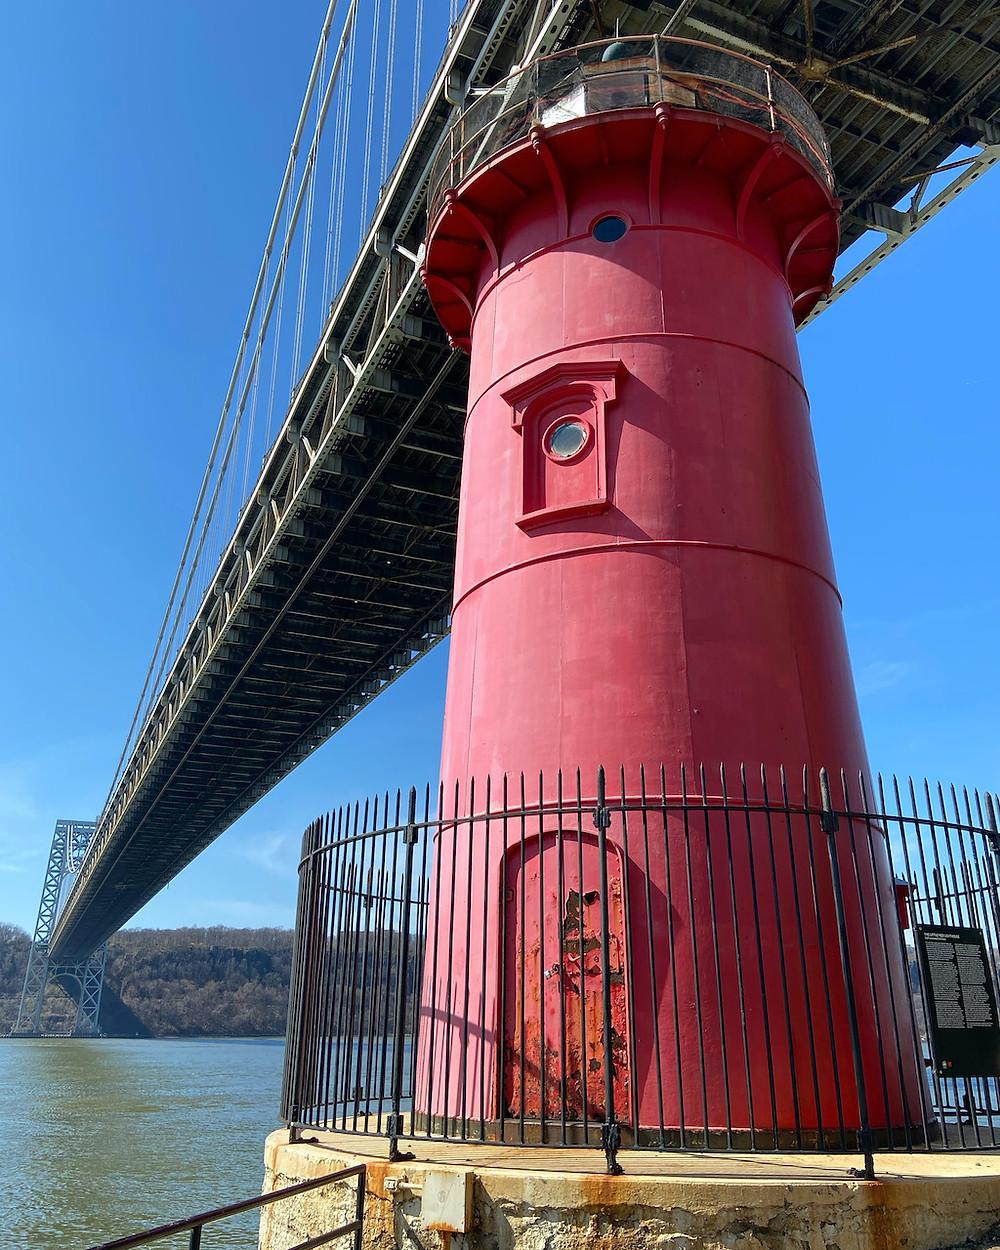 The Little Red Lighthouse under the George Washington Bridge